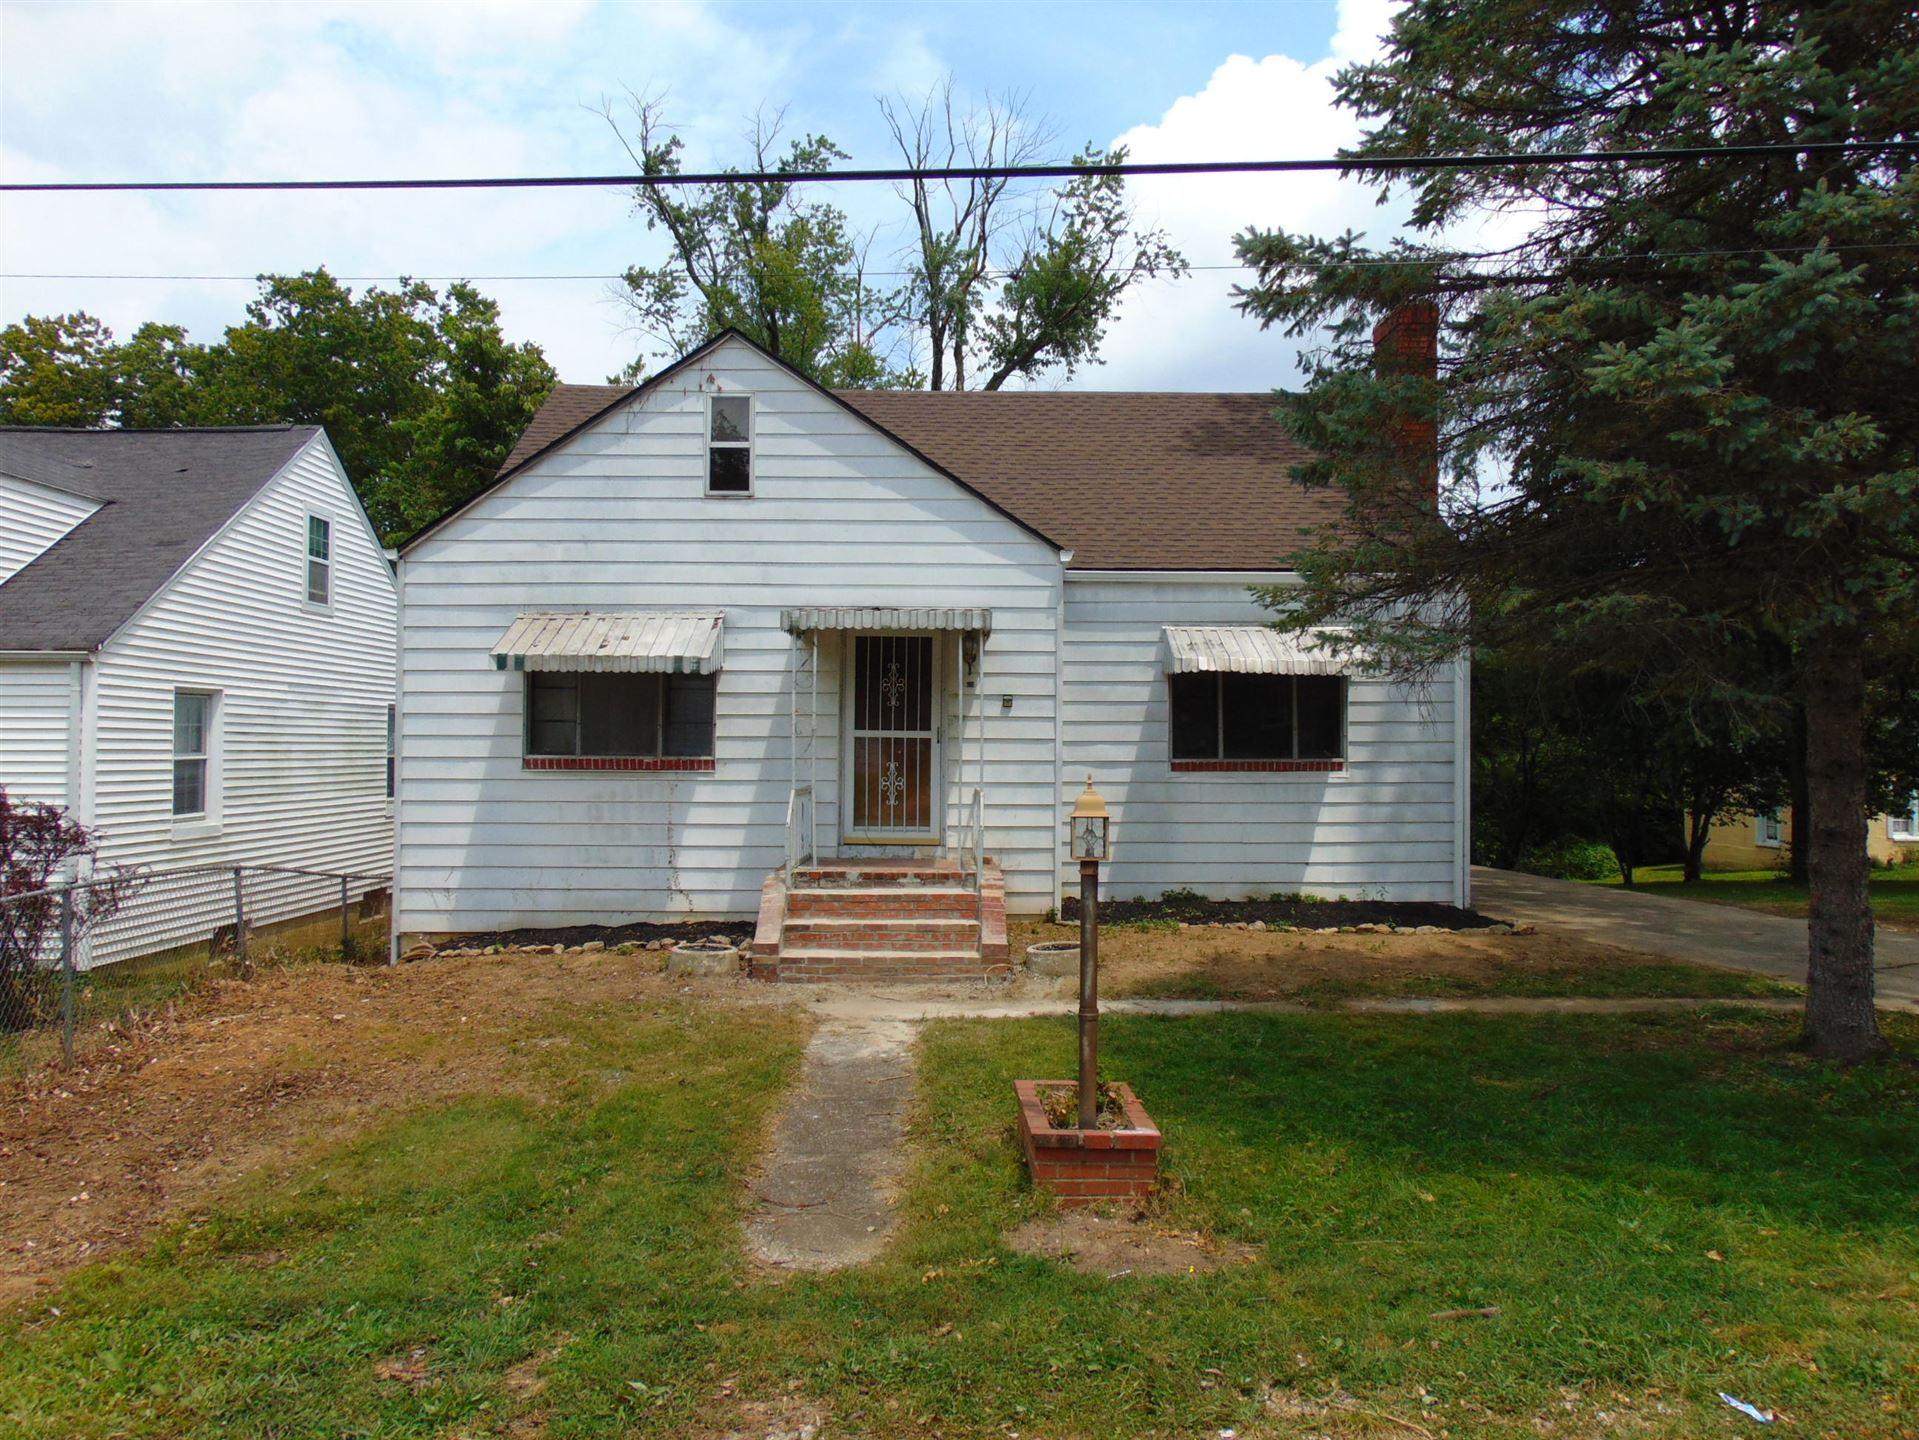 110 Lowell, Richmond, KY 40475 - MLS#: 20114592